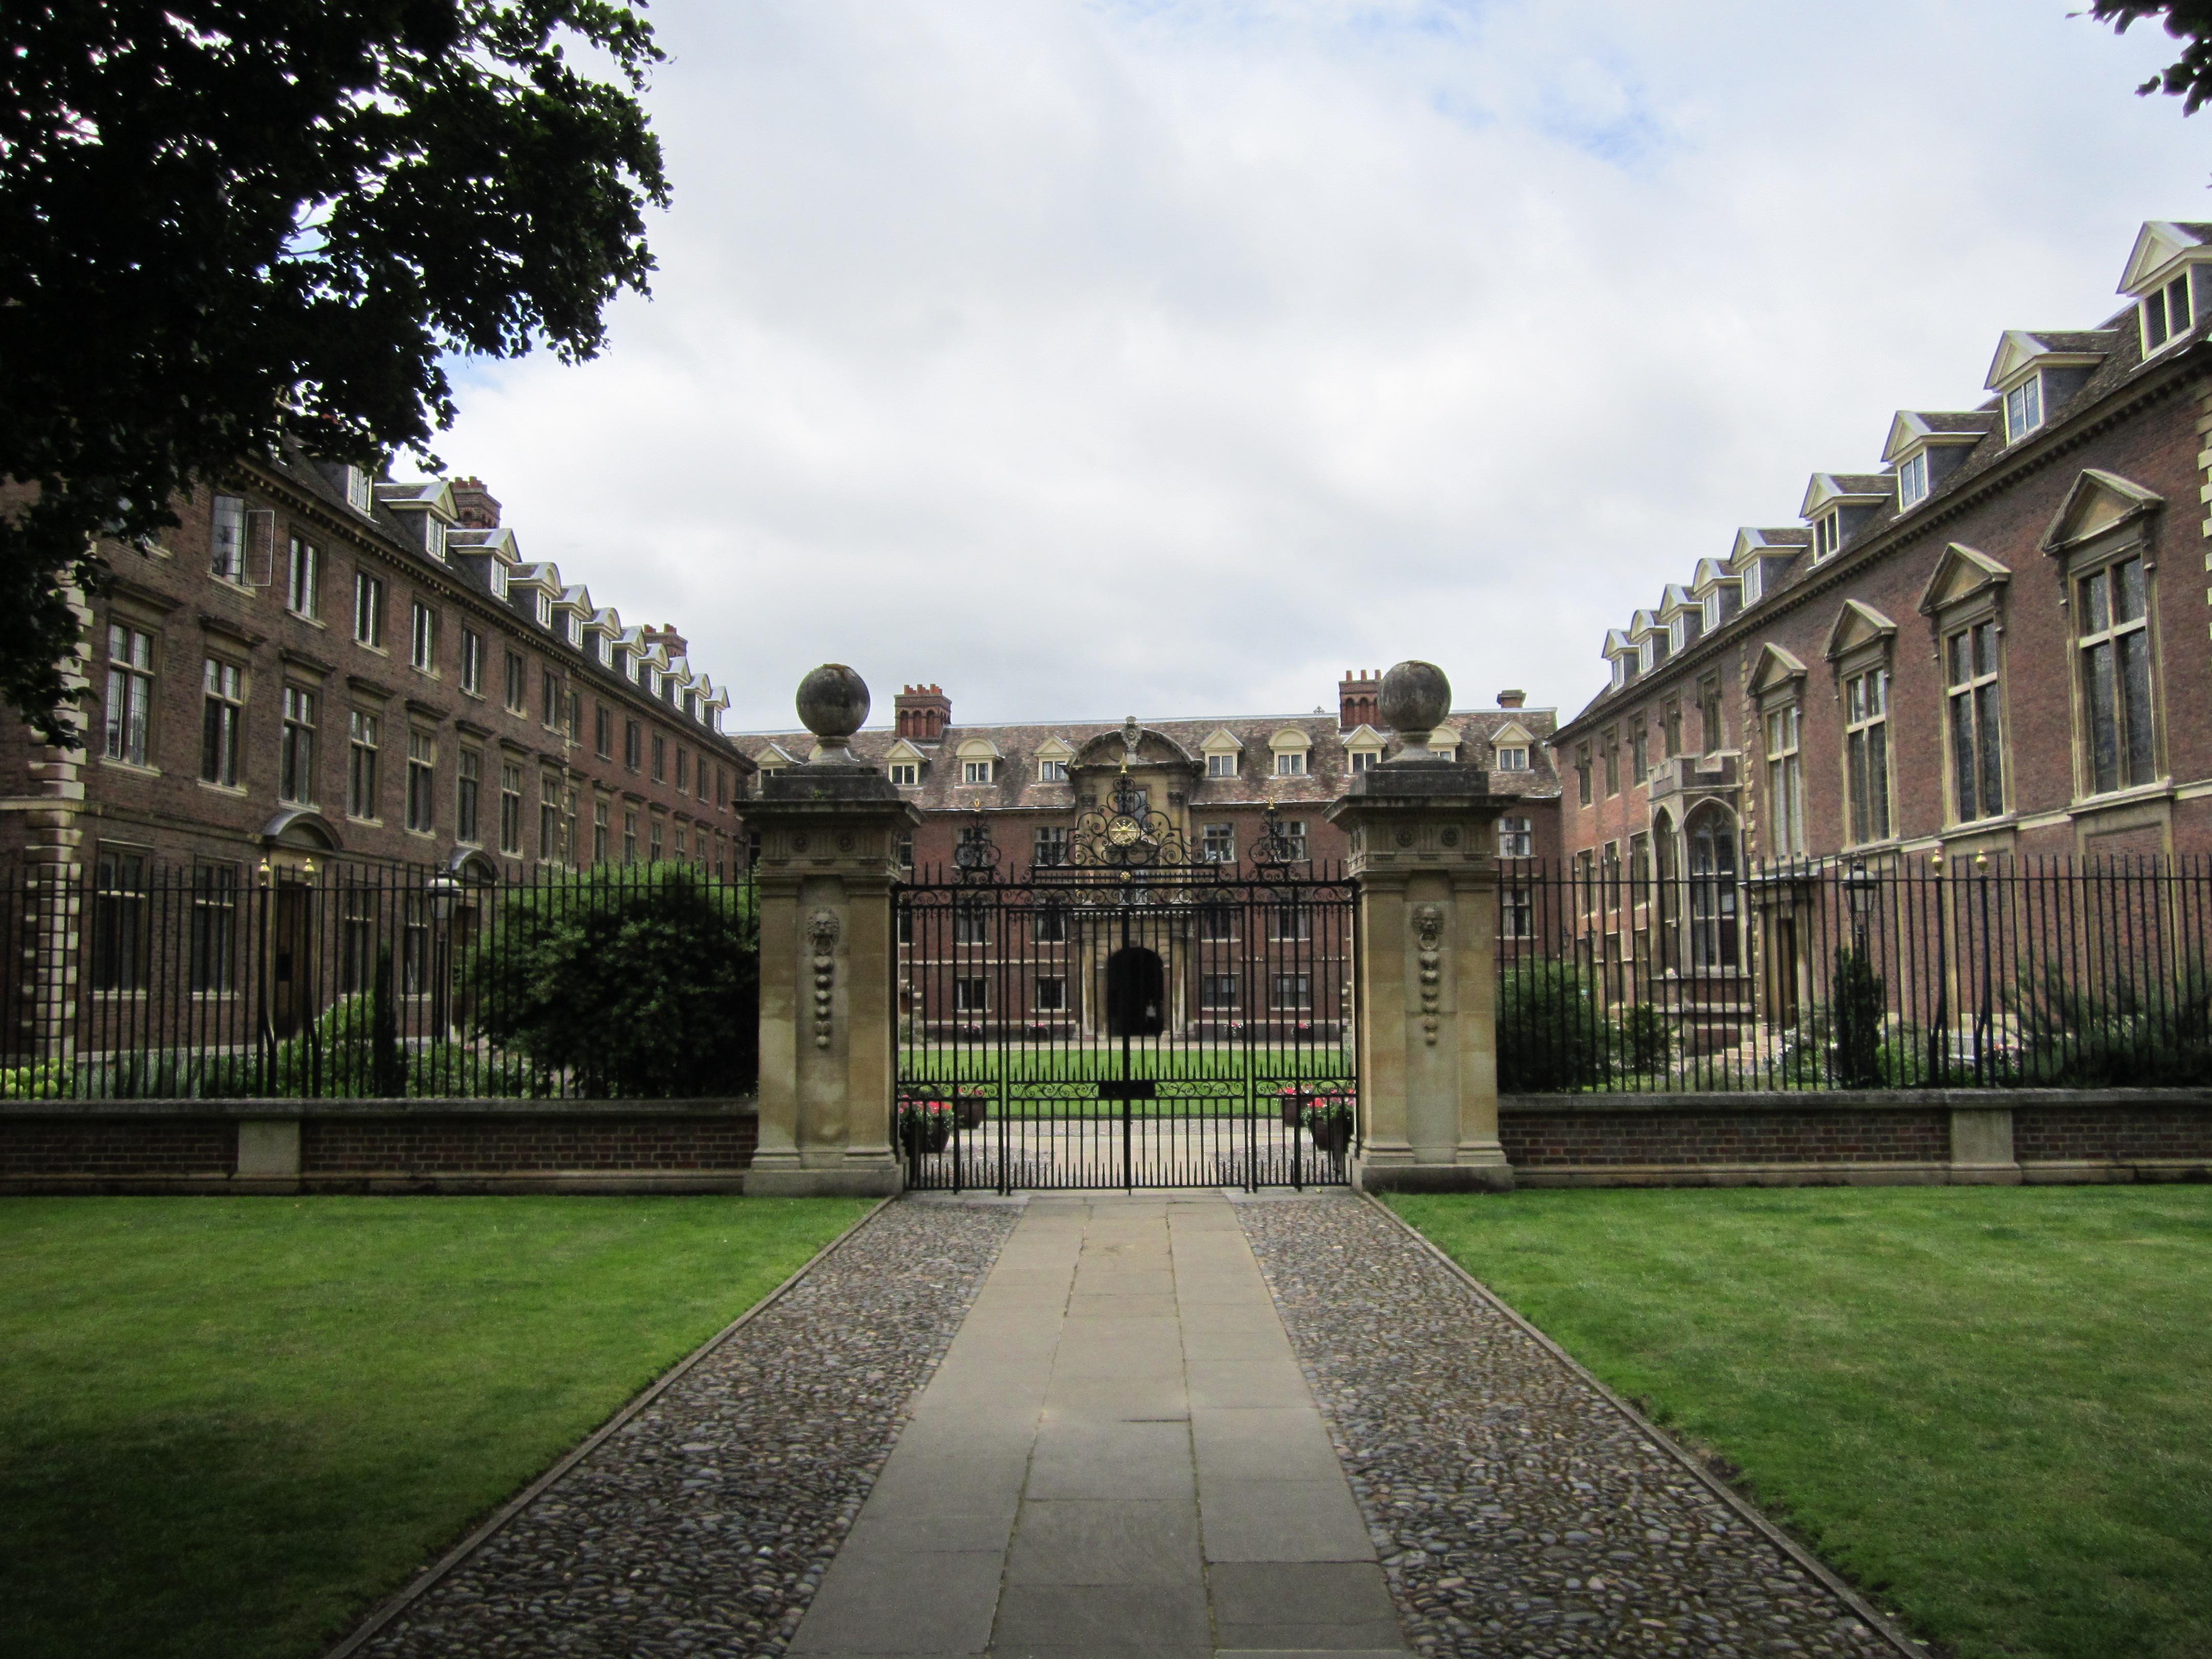 St Catharine's College, Cambridge, England - IMG 0686.jpg